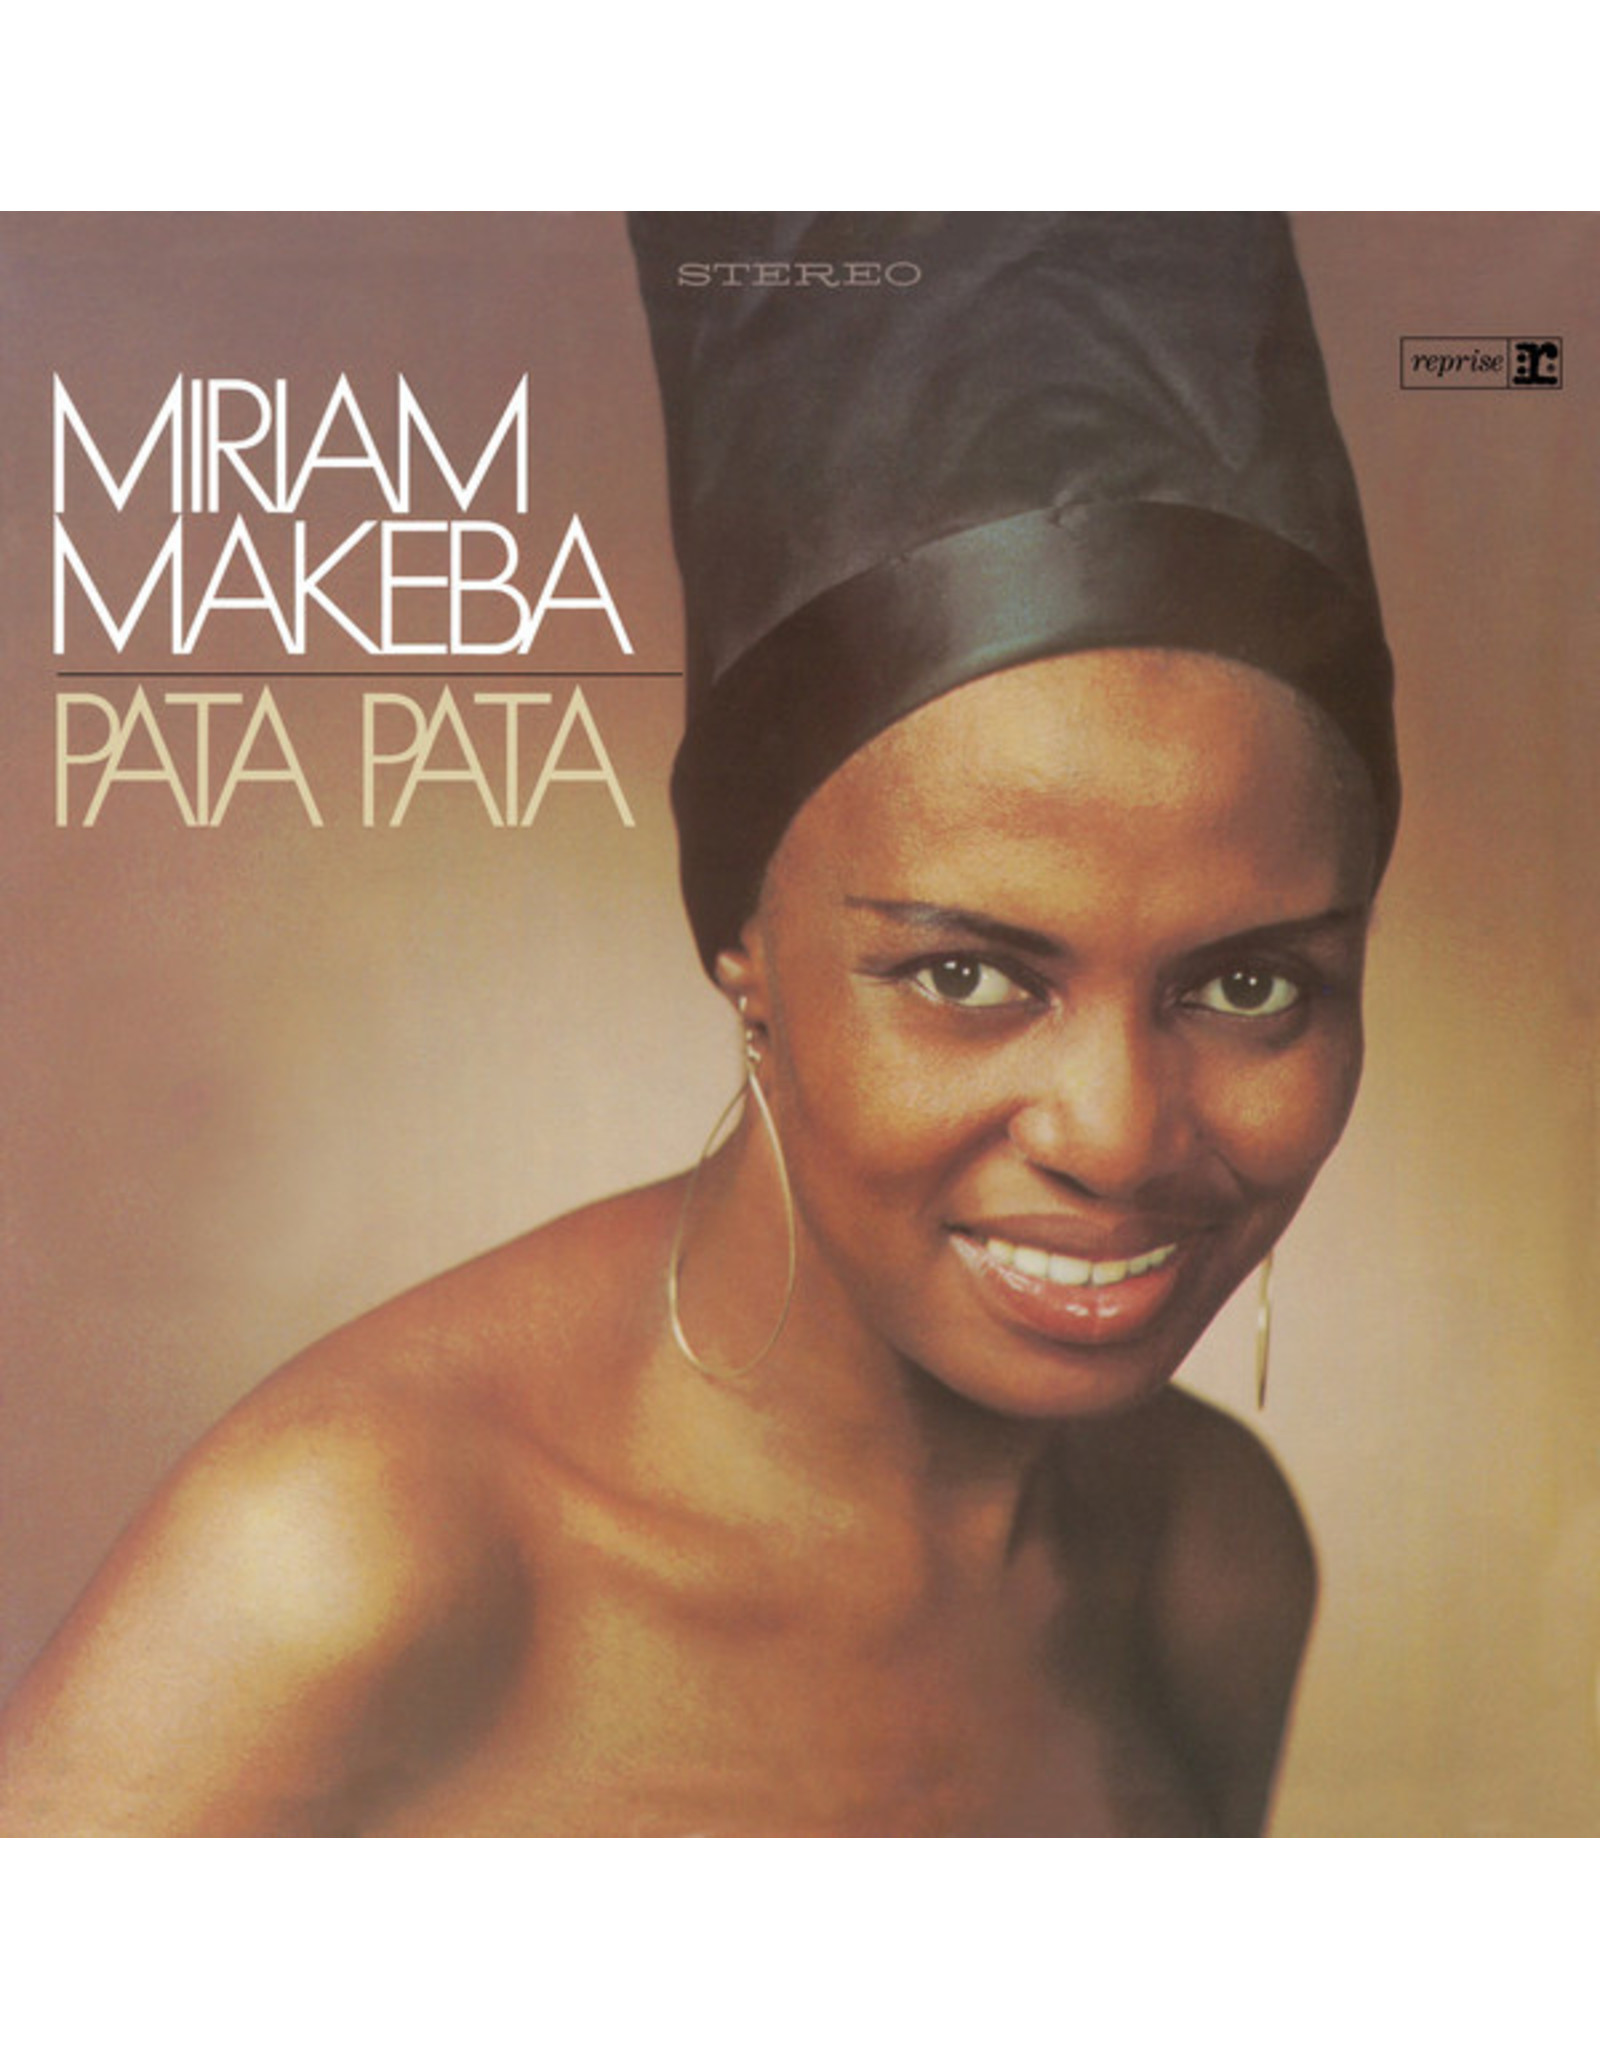 New Vinyl Miriam Makeba - Pata Pata 2LP